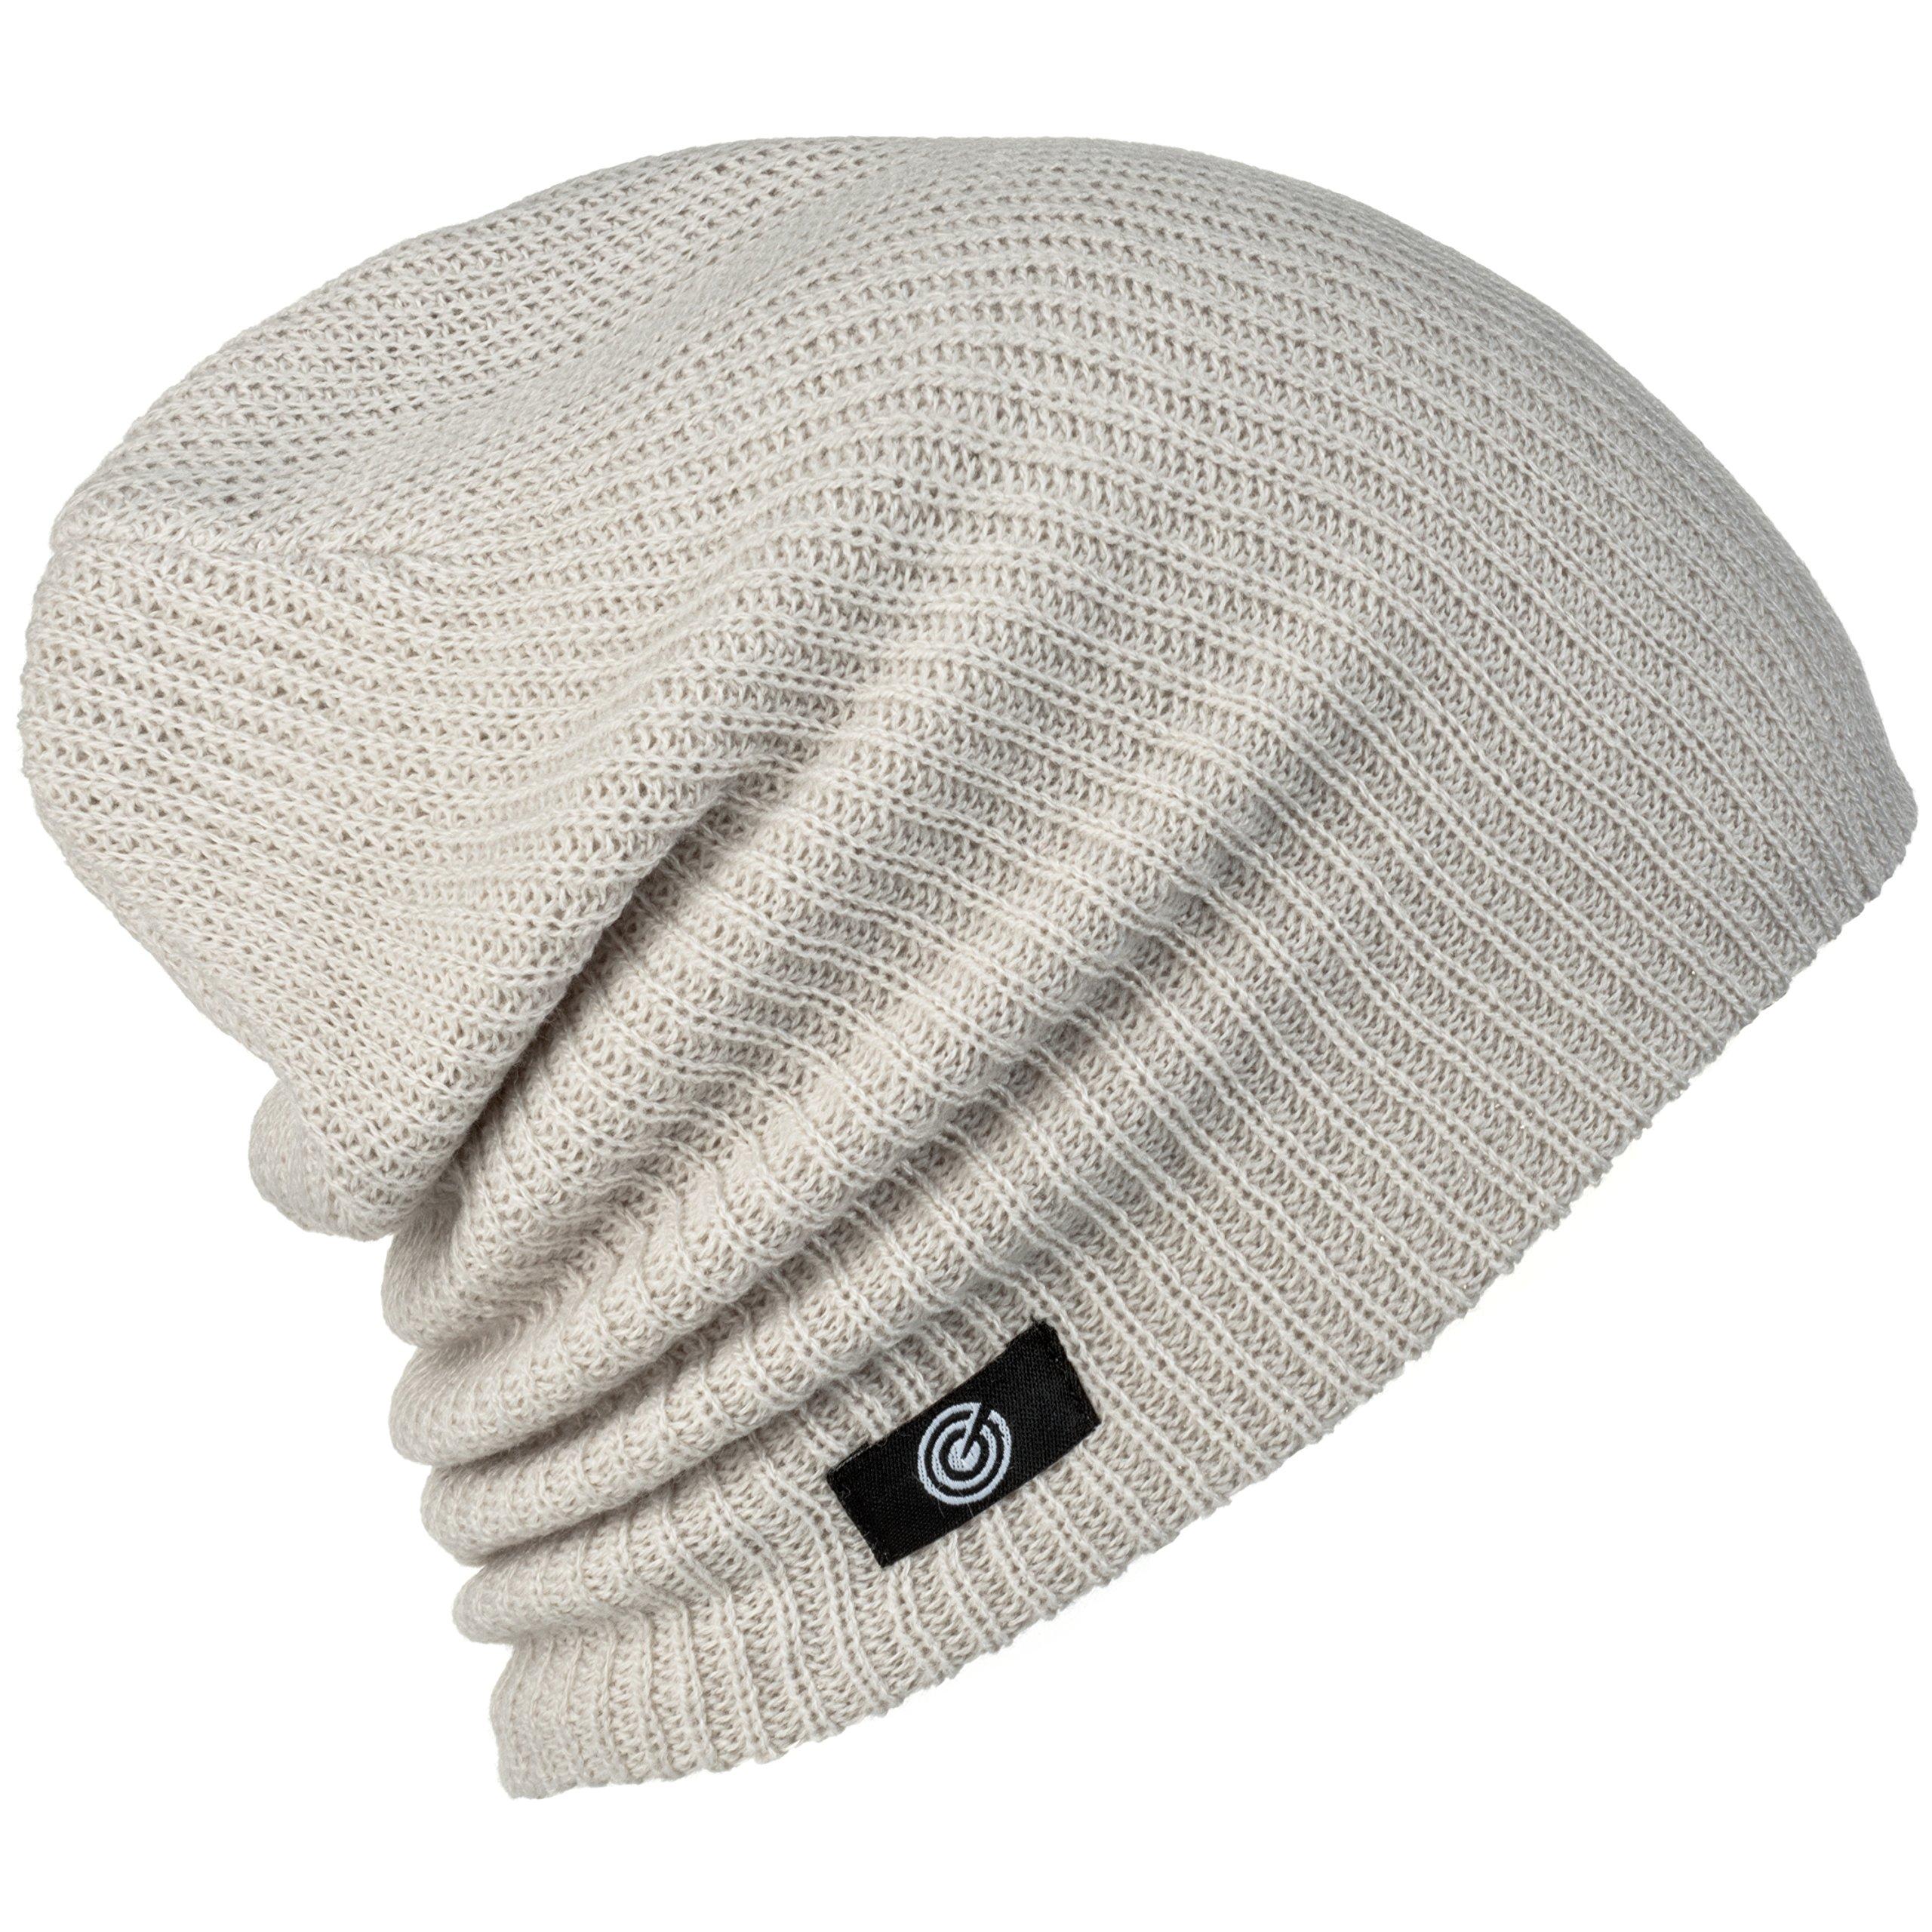 de5a5e87 Revony Evony Lightweight Casual Beanie - Warm, Soft Beanie Hat product image